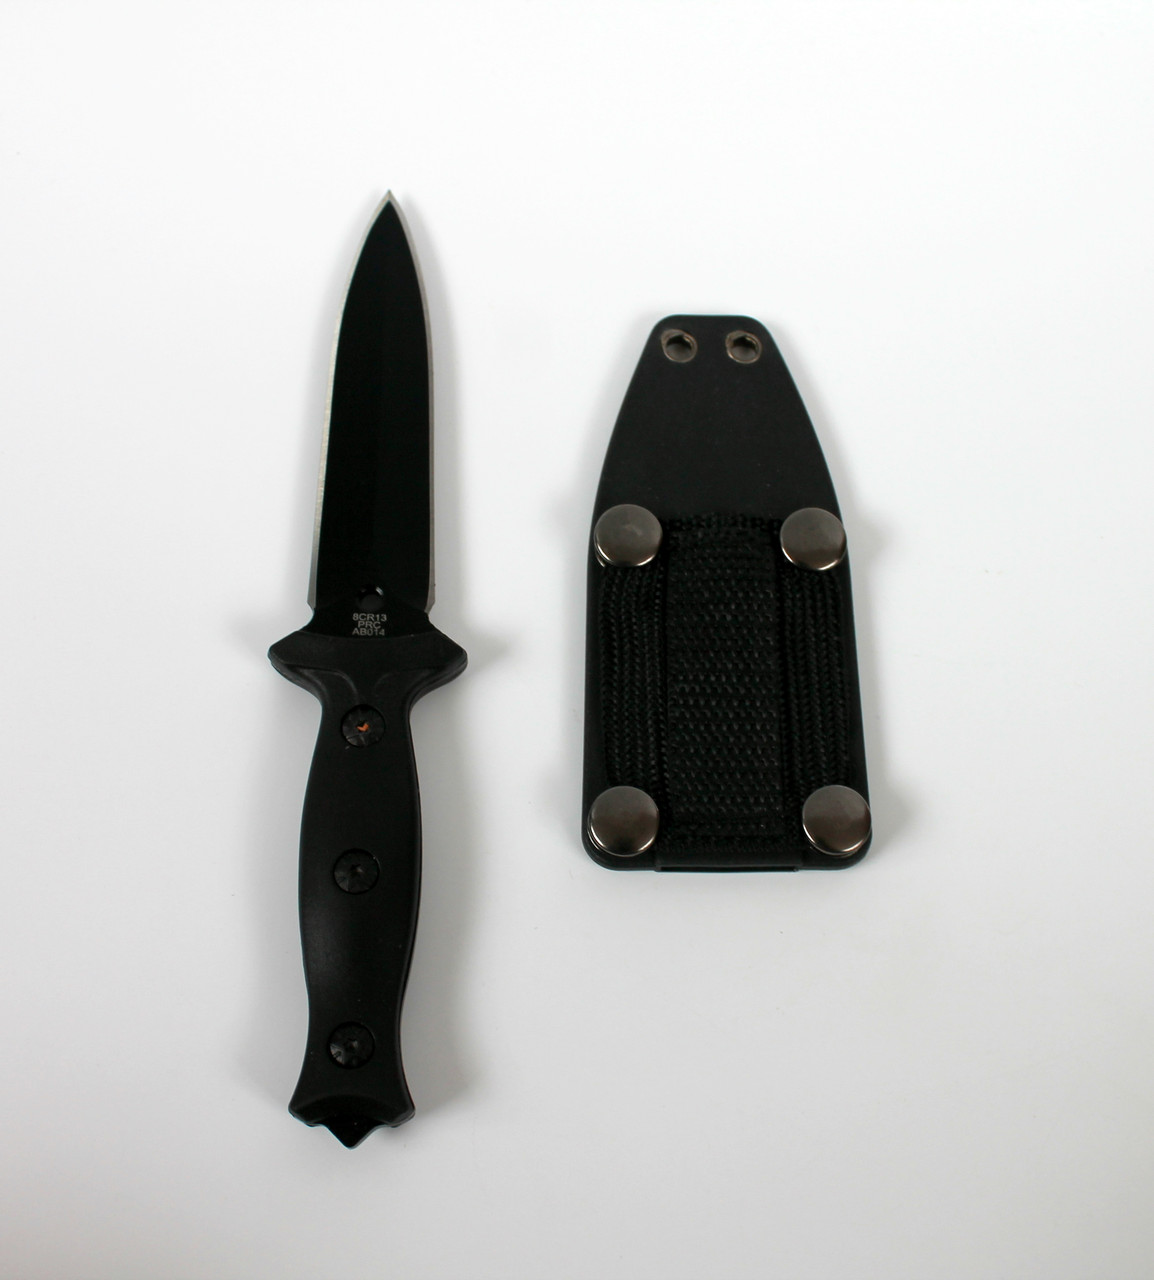 Нож в чехле Heywas AB014 охотничий